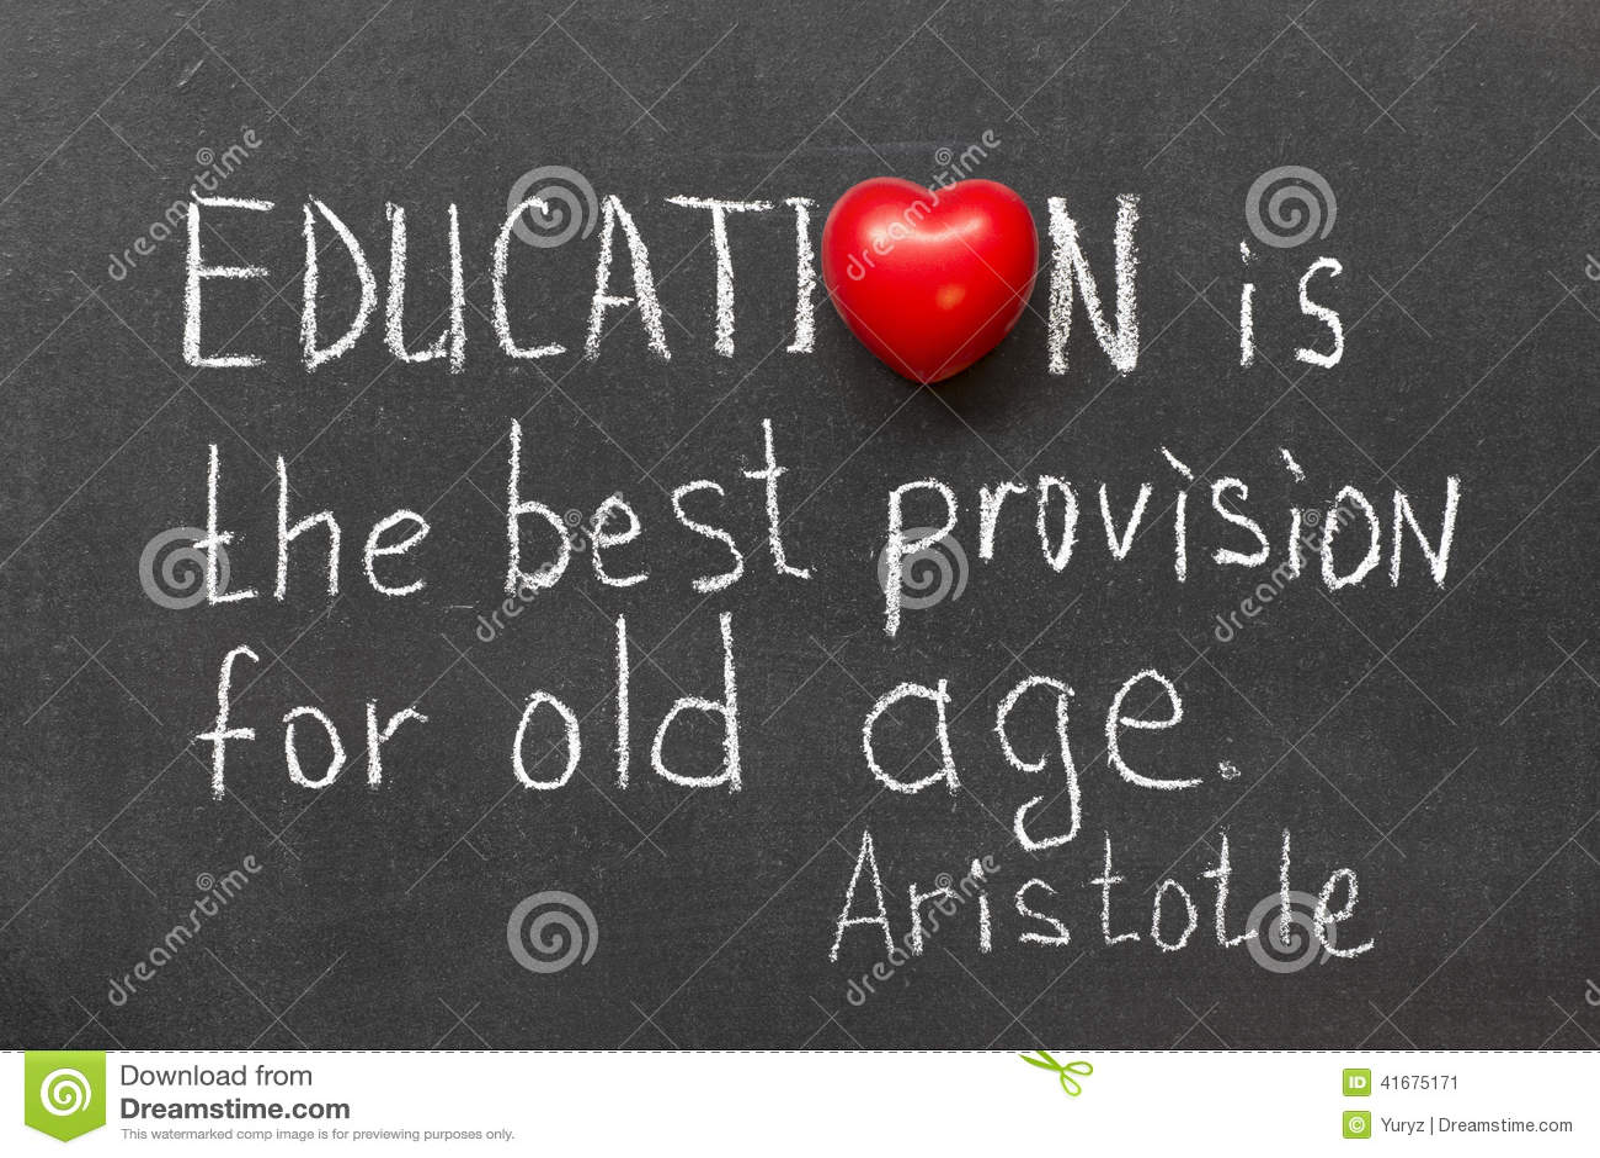 education is stock image image of wisdom aristotle